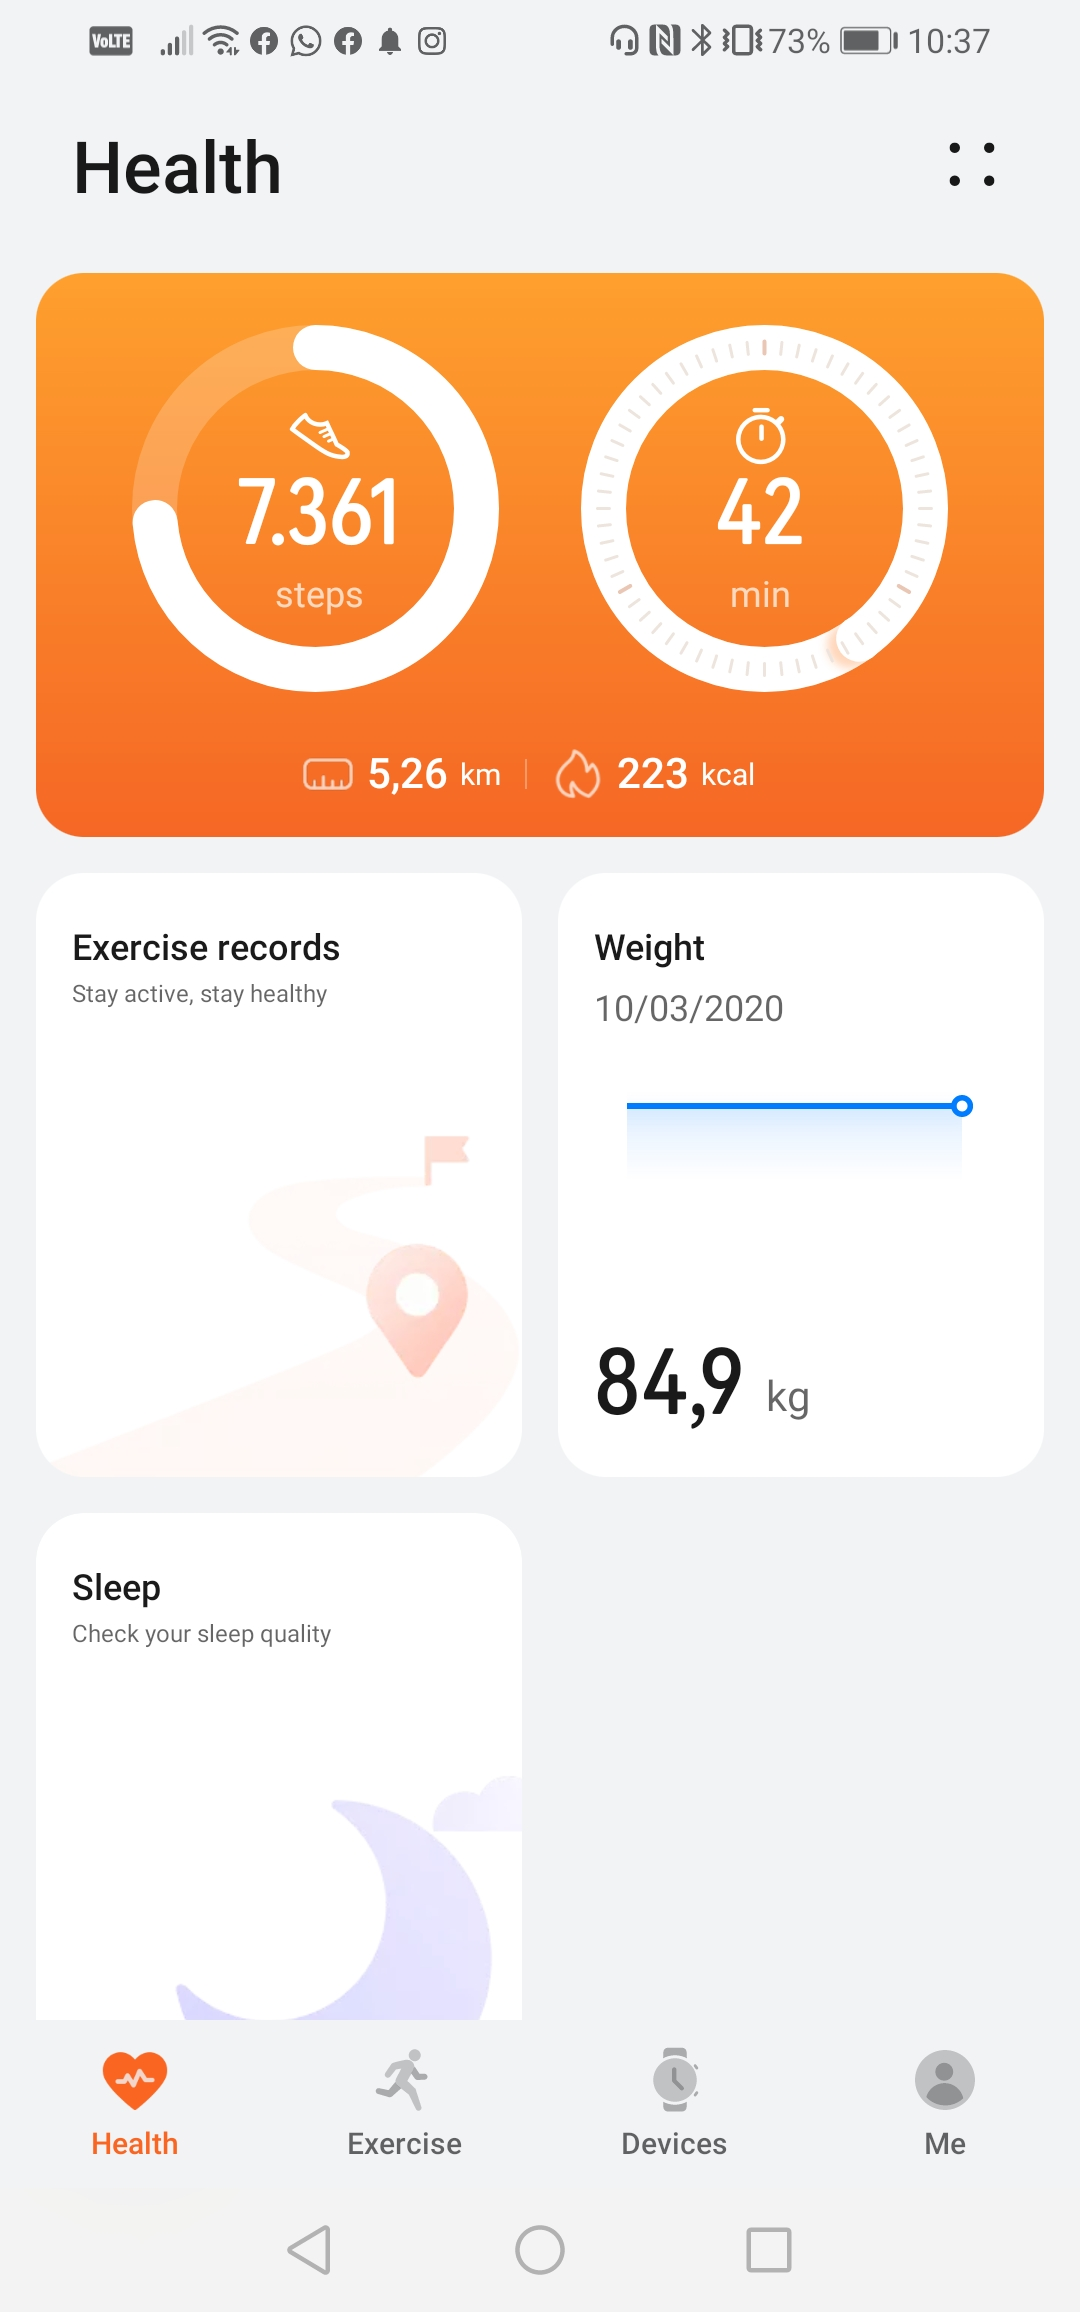 screenshot_20210510_103738_com-huawei-health